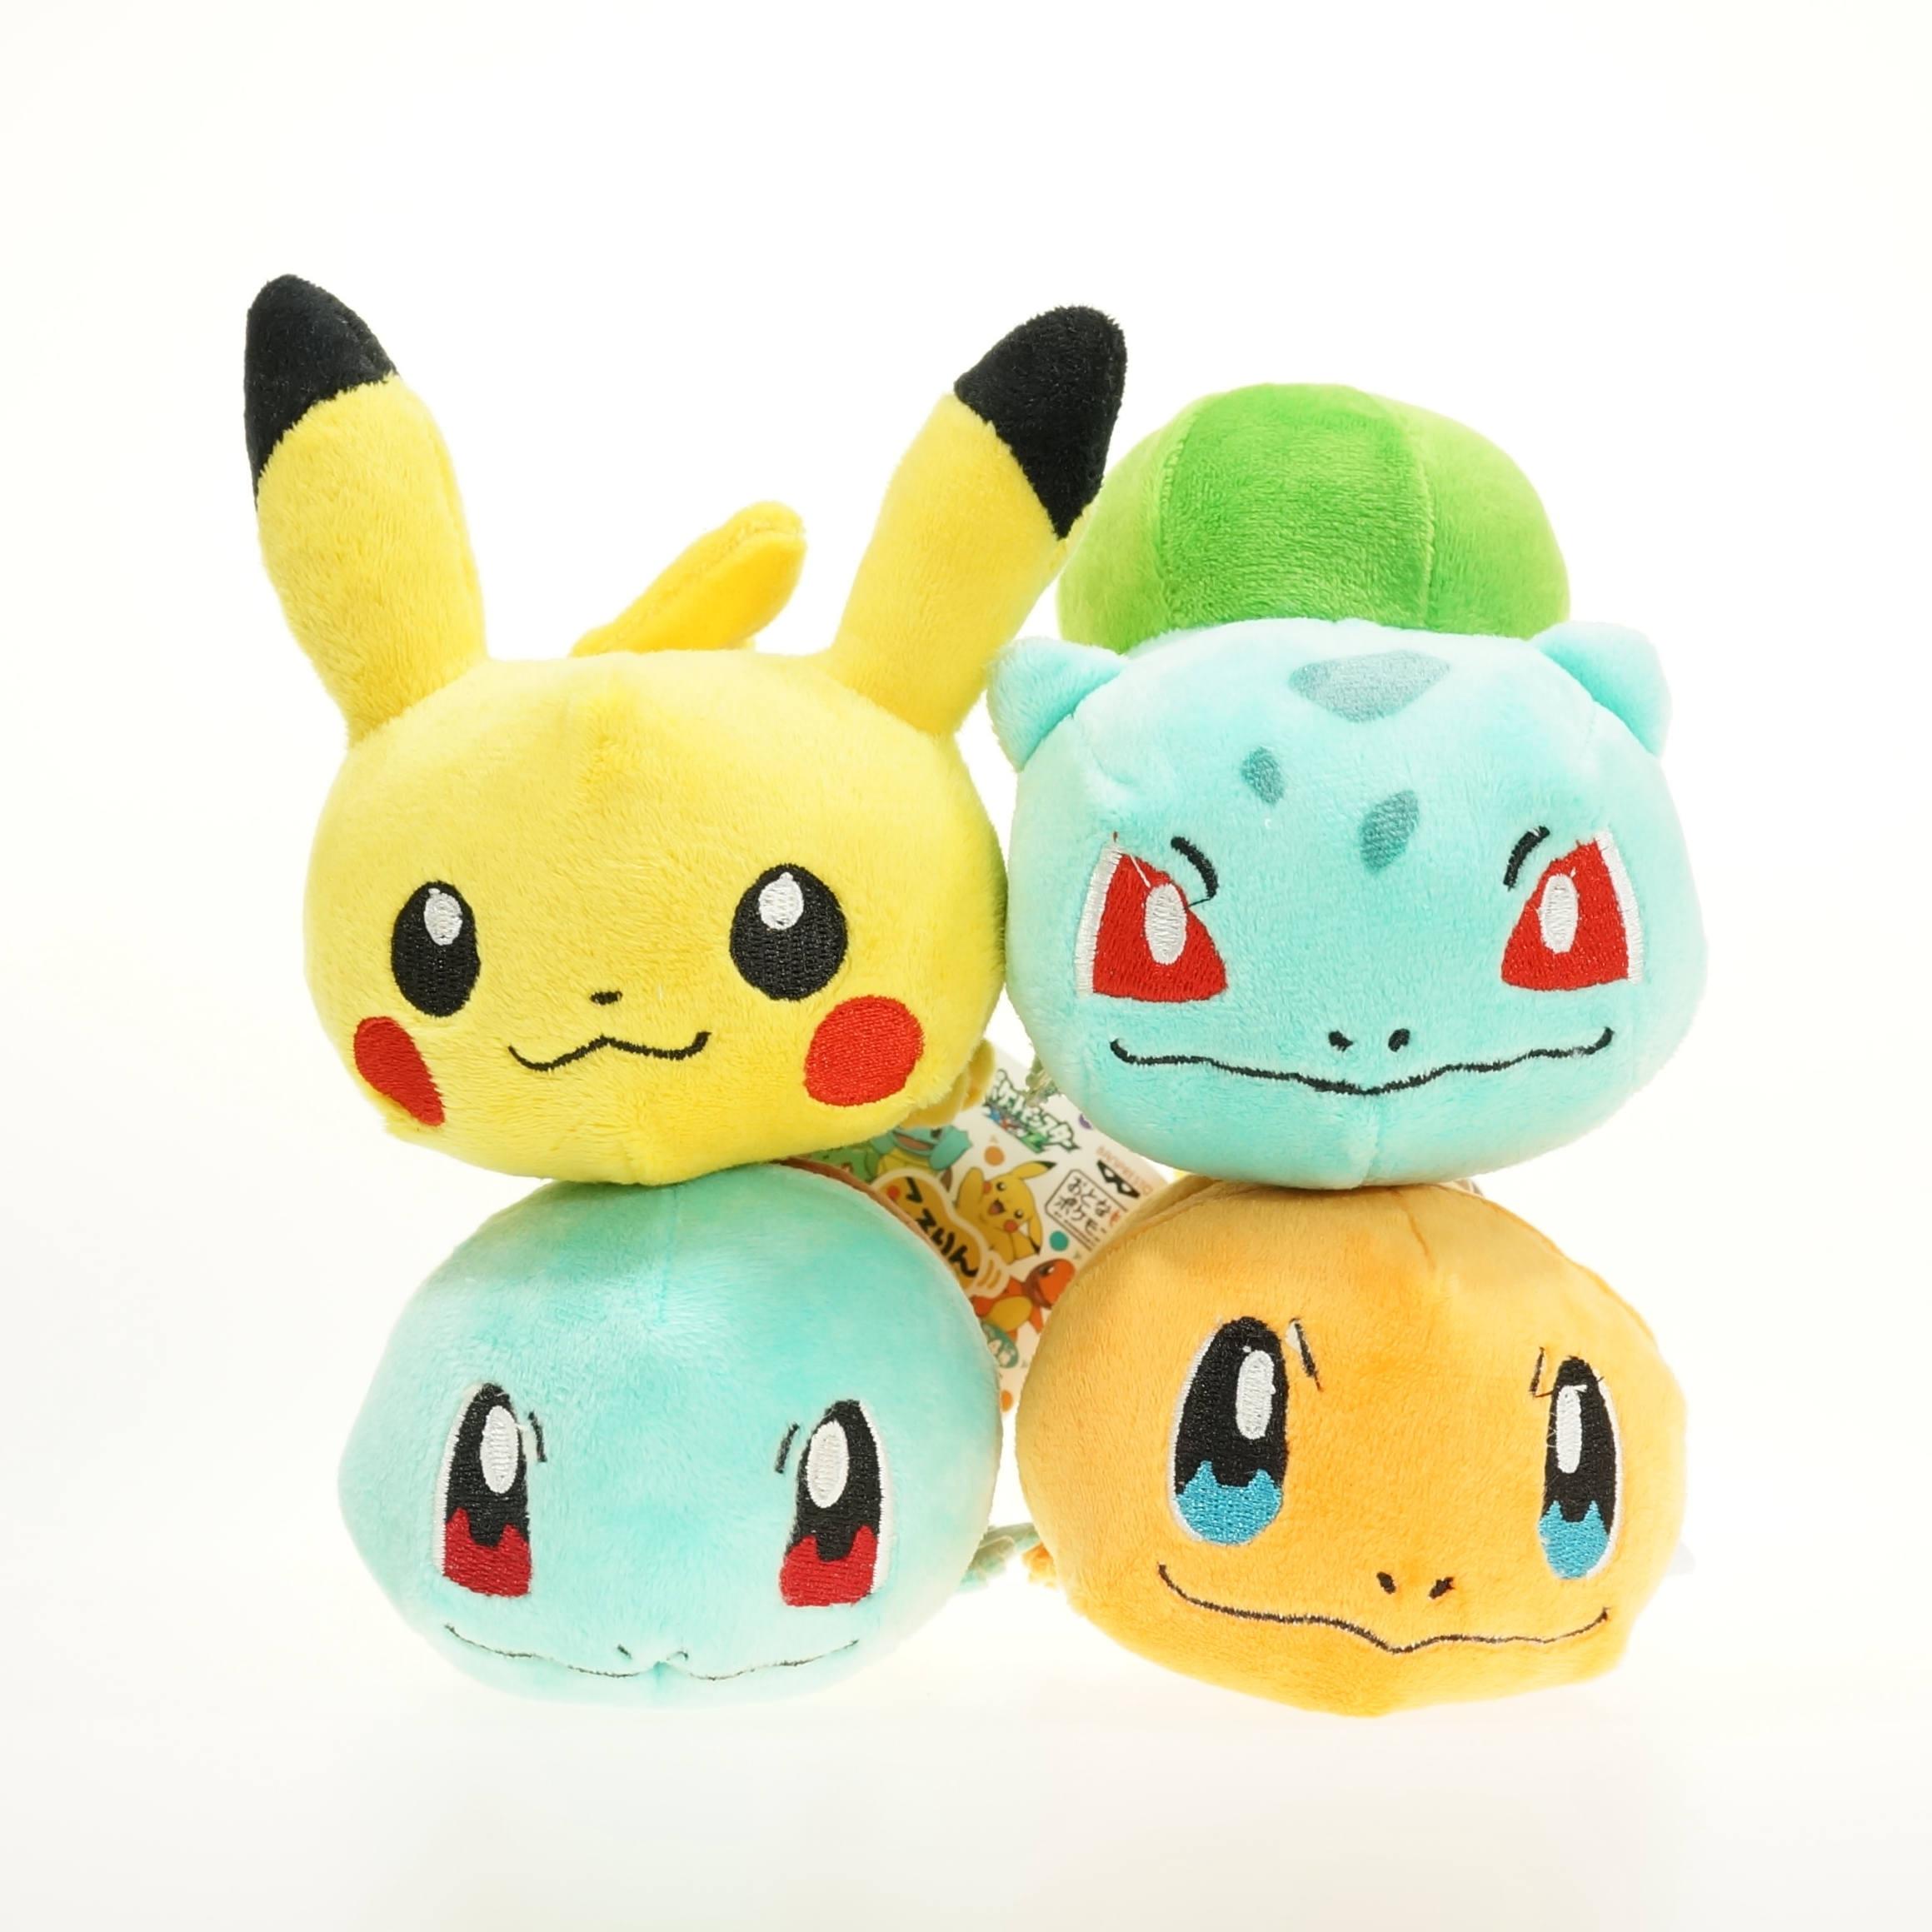 Pocket Cute Chubby Pikachu & Bulbasaur & Squirtle & Charmander Big Head Cute Lying Plush Toys